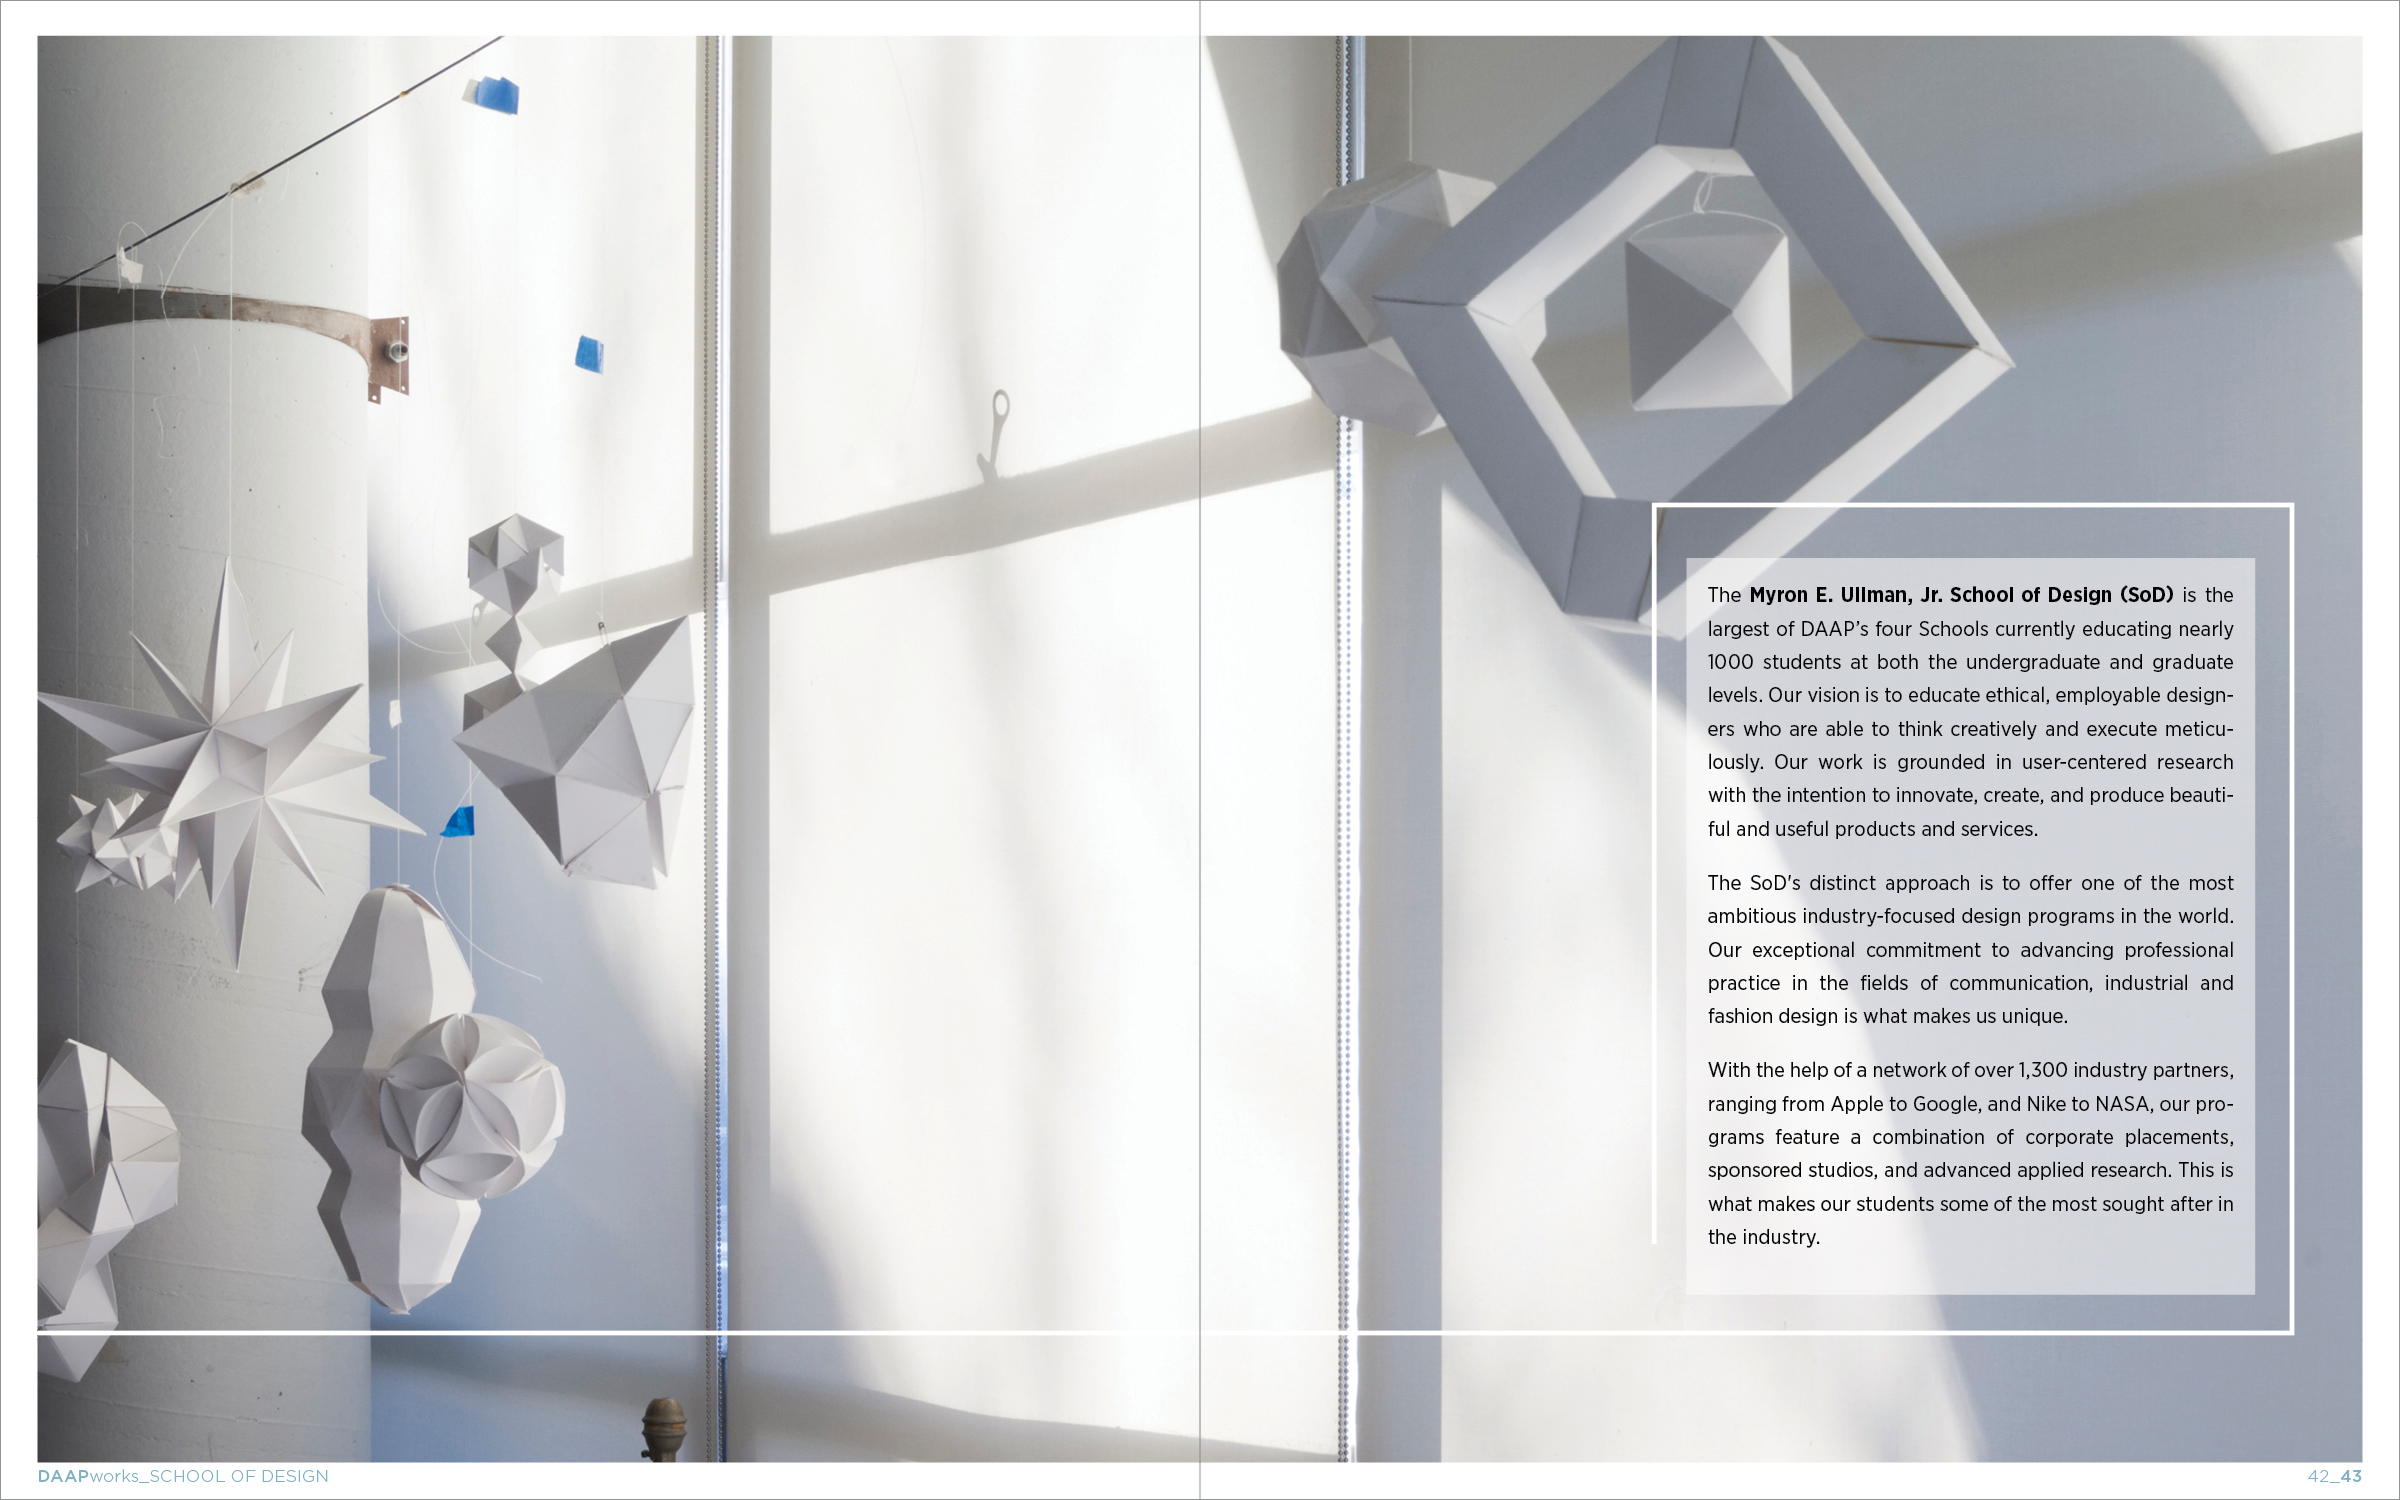 DAAPworksBook_2Design3.jpg